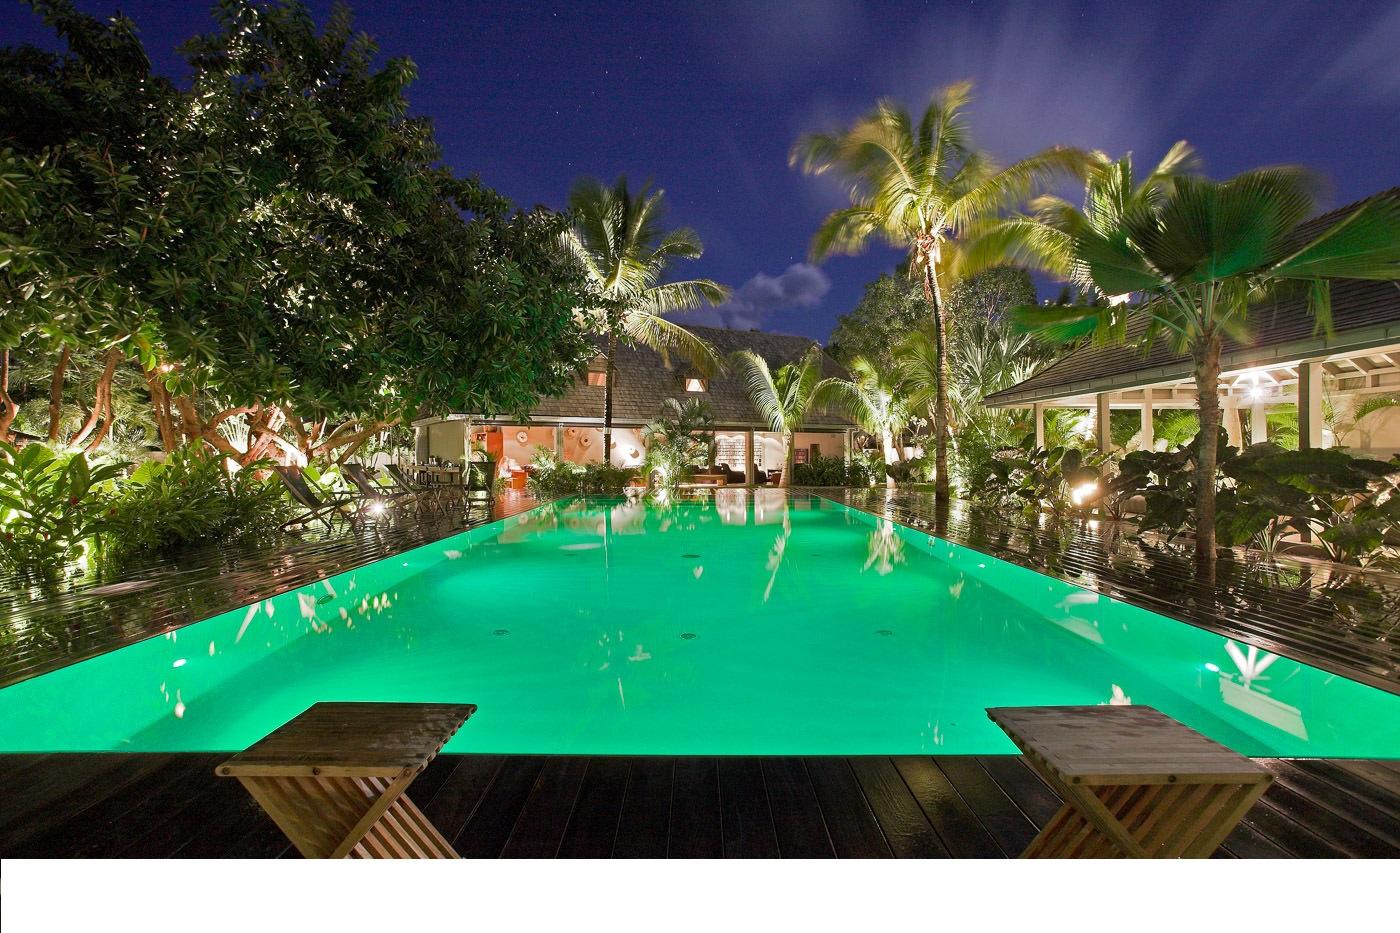 location saint barthelemy villa de luxe avec piscine. Black Bedroom Furniture Sets. Home Design Ideas